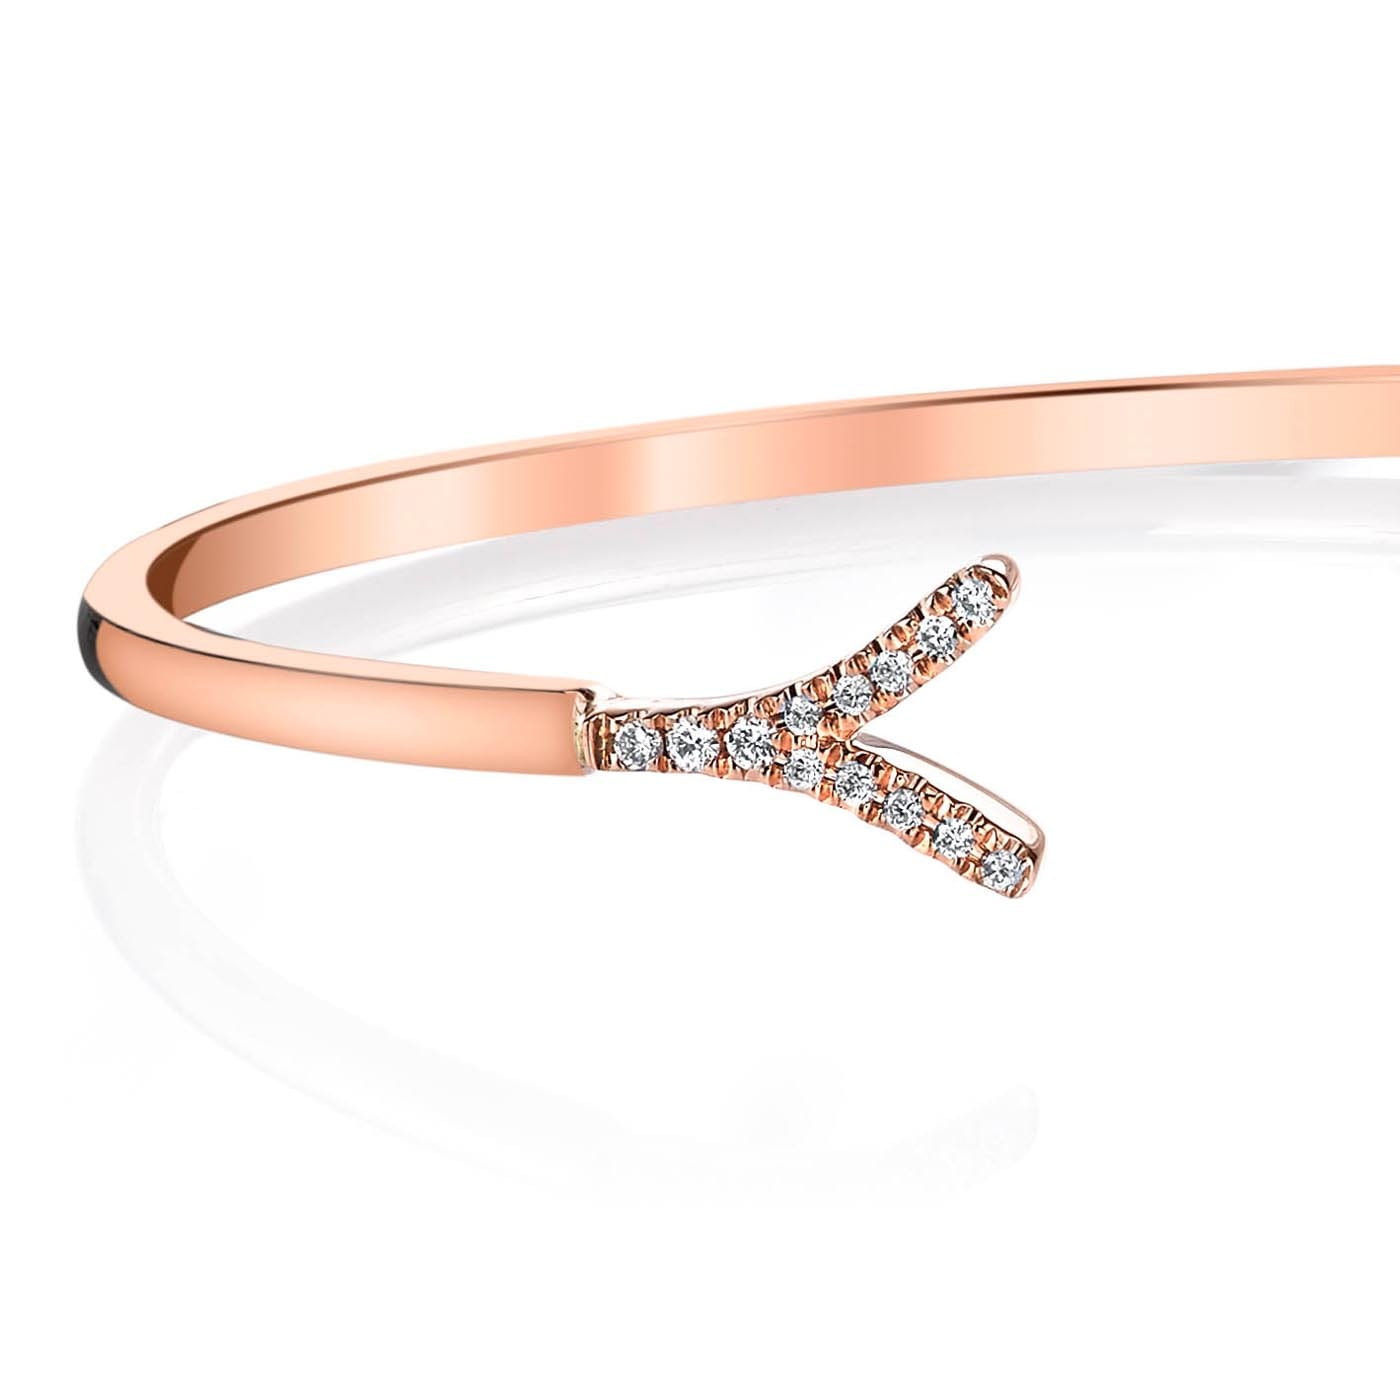 Diamond Bracelet - Bangles & Cuffs Style #: MARS-26627